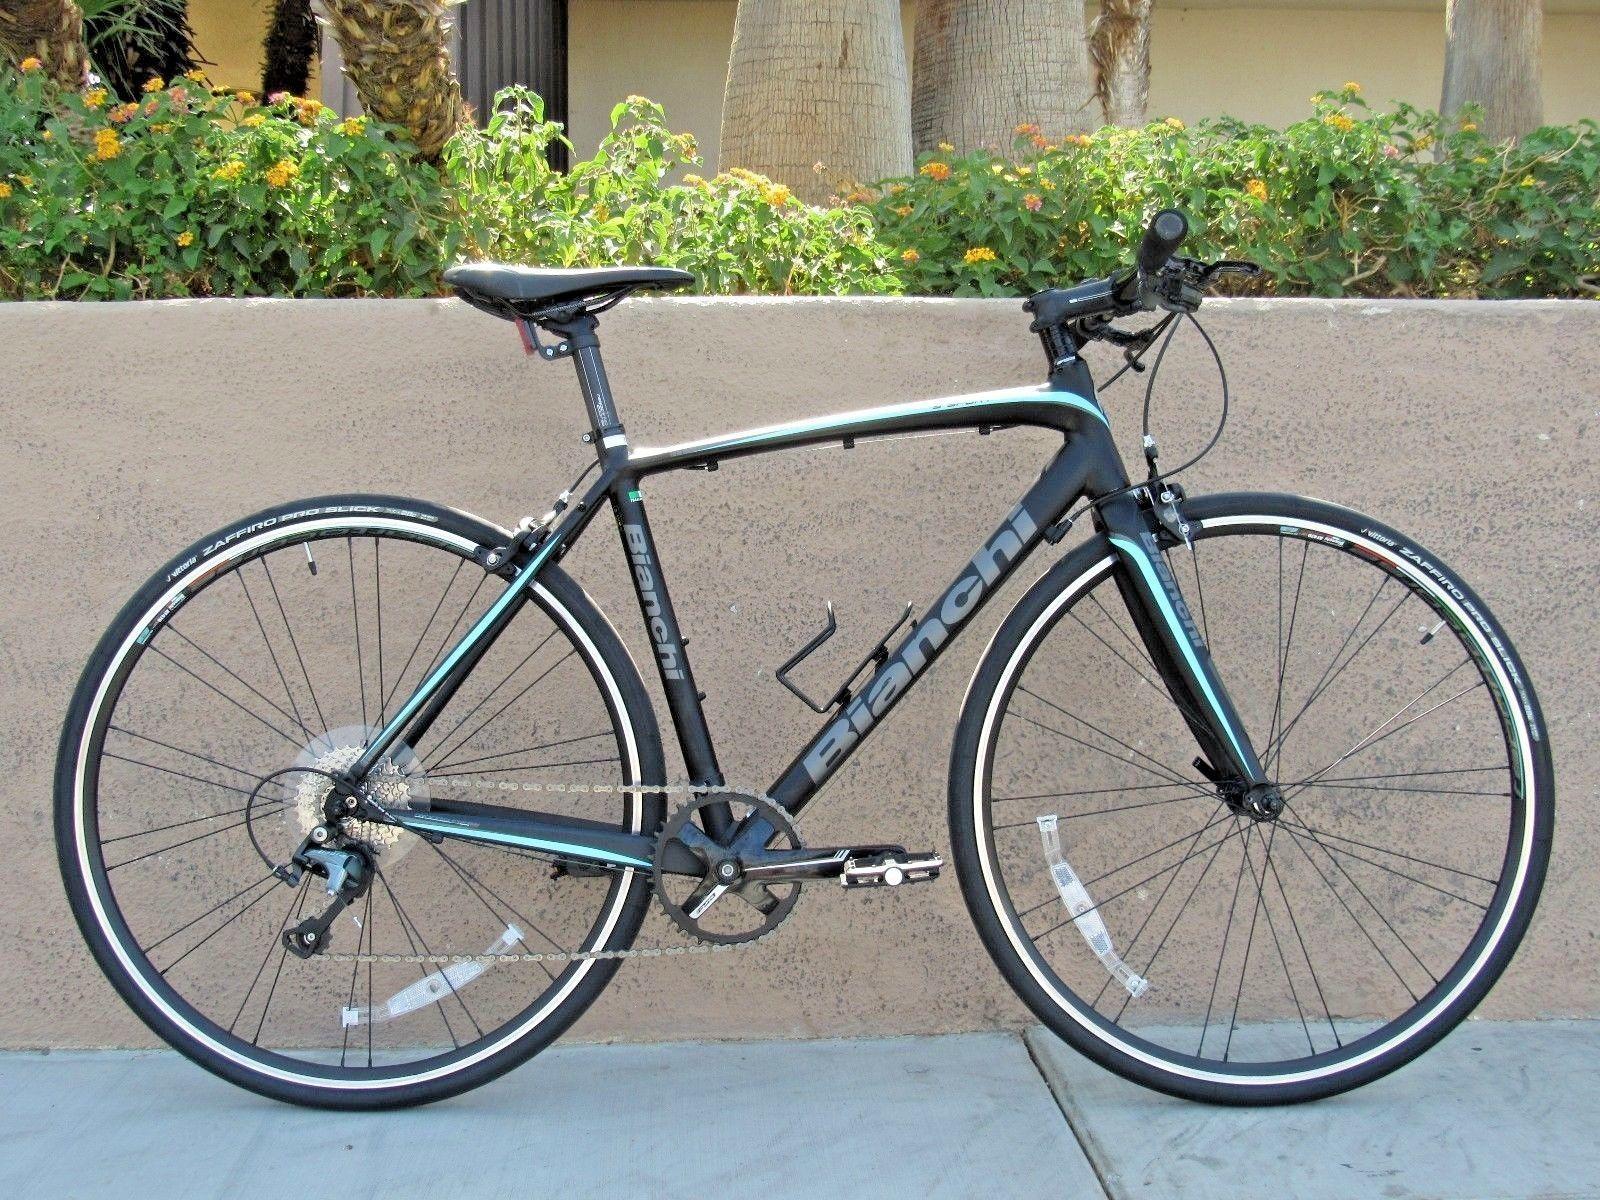 ceea99a6419 DEMO 2017 53CM BIANCHI IMPULSO S-SPORT TIAGRA 1x10 DISC FLAT BAR ROAD BIKE!   roadbike